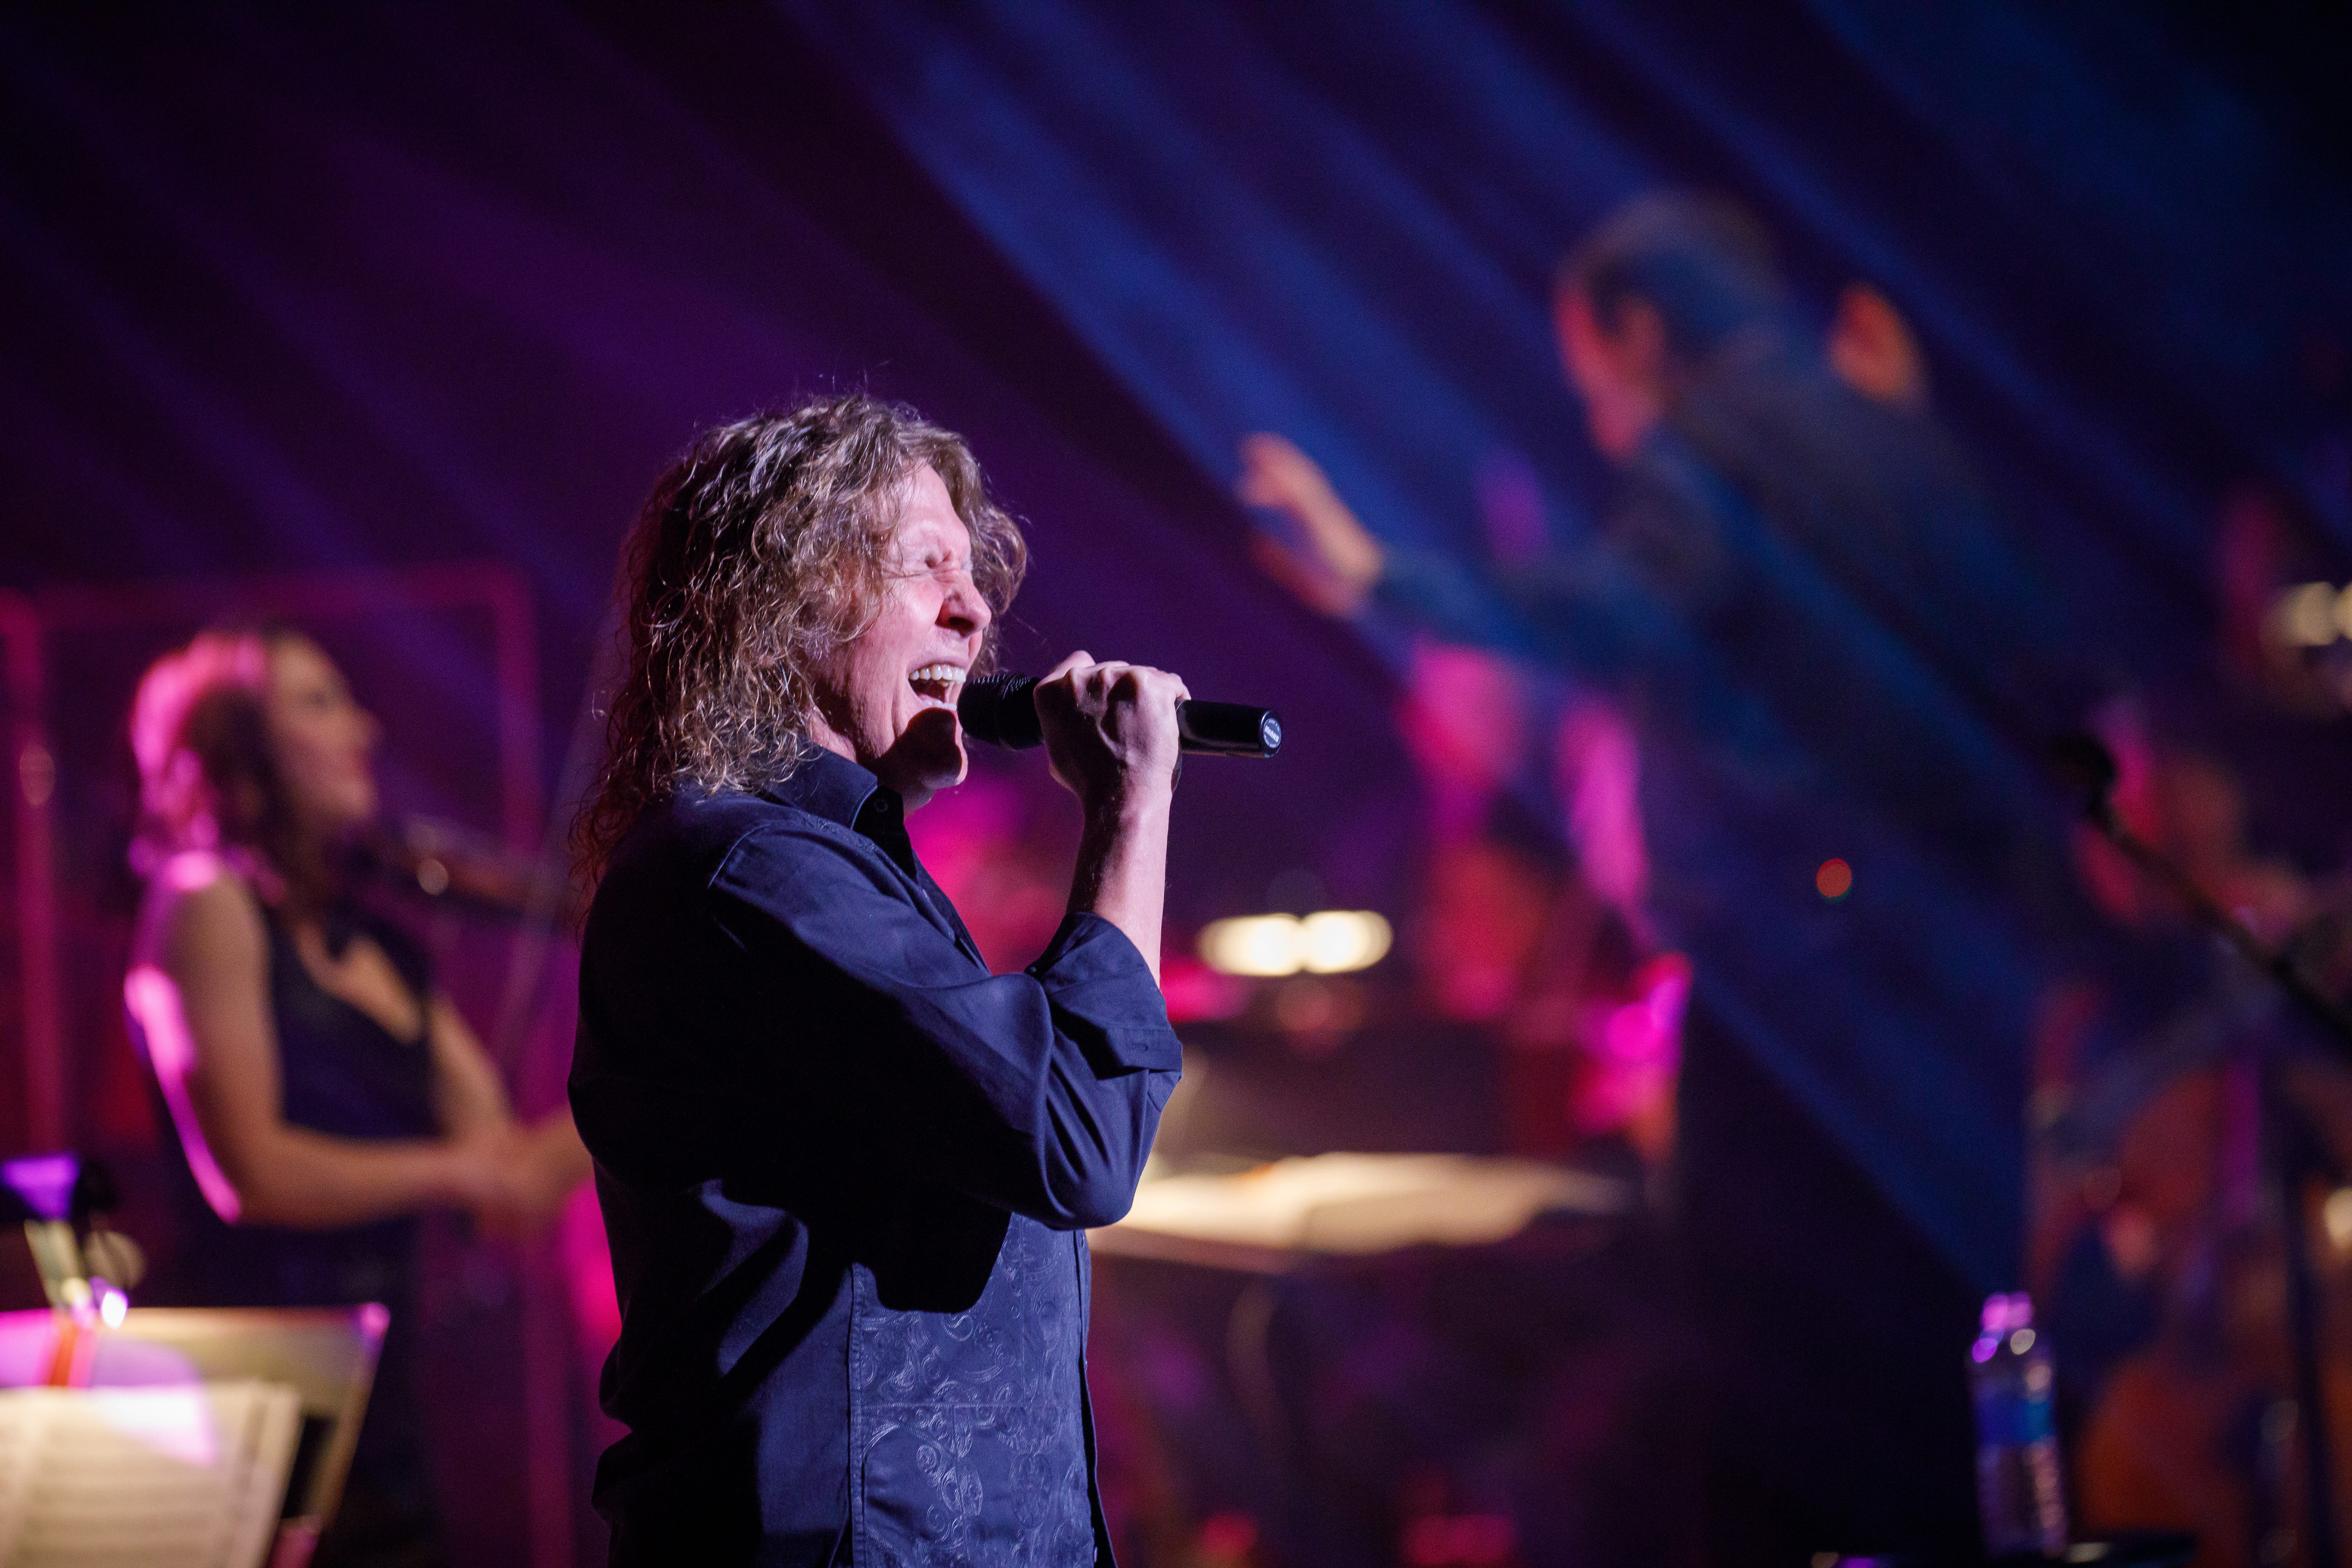 Review: South Bend Symphony, Zebra s Jackson and Windborne rock with Led Zeppelin